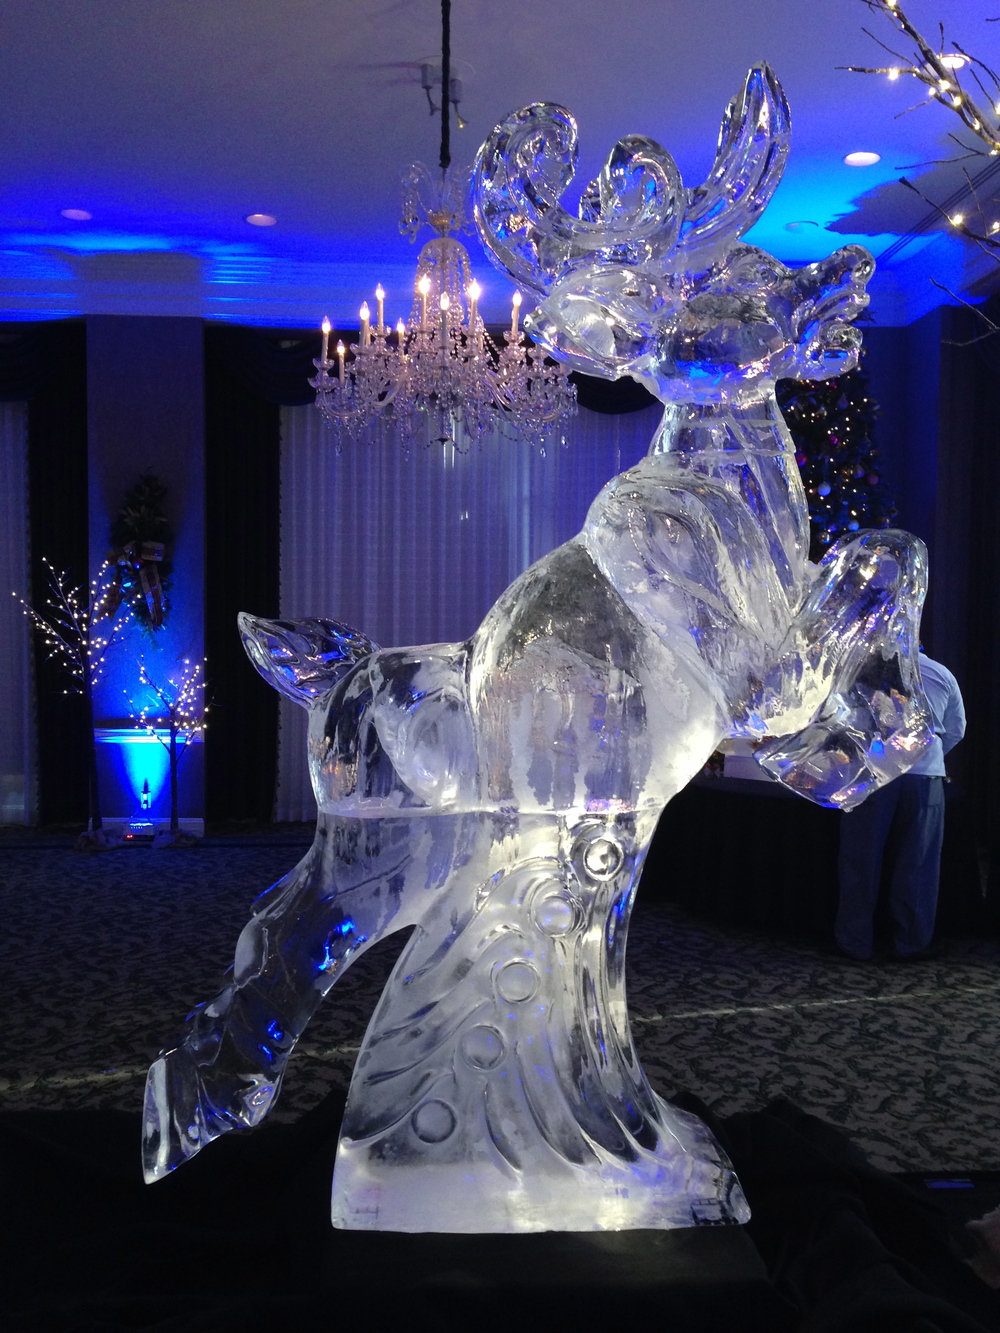 6) Jumping Reindeer Ice Sculpture